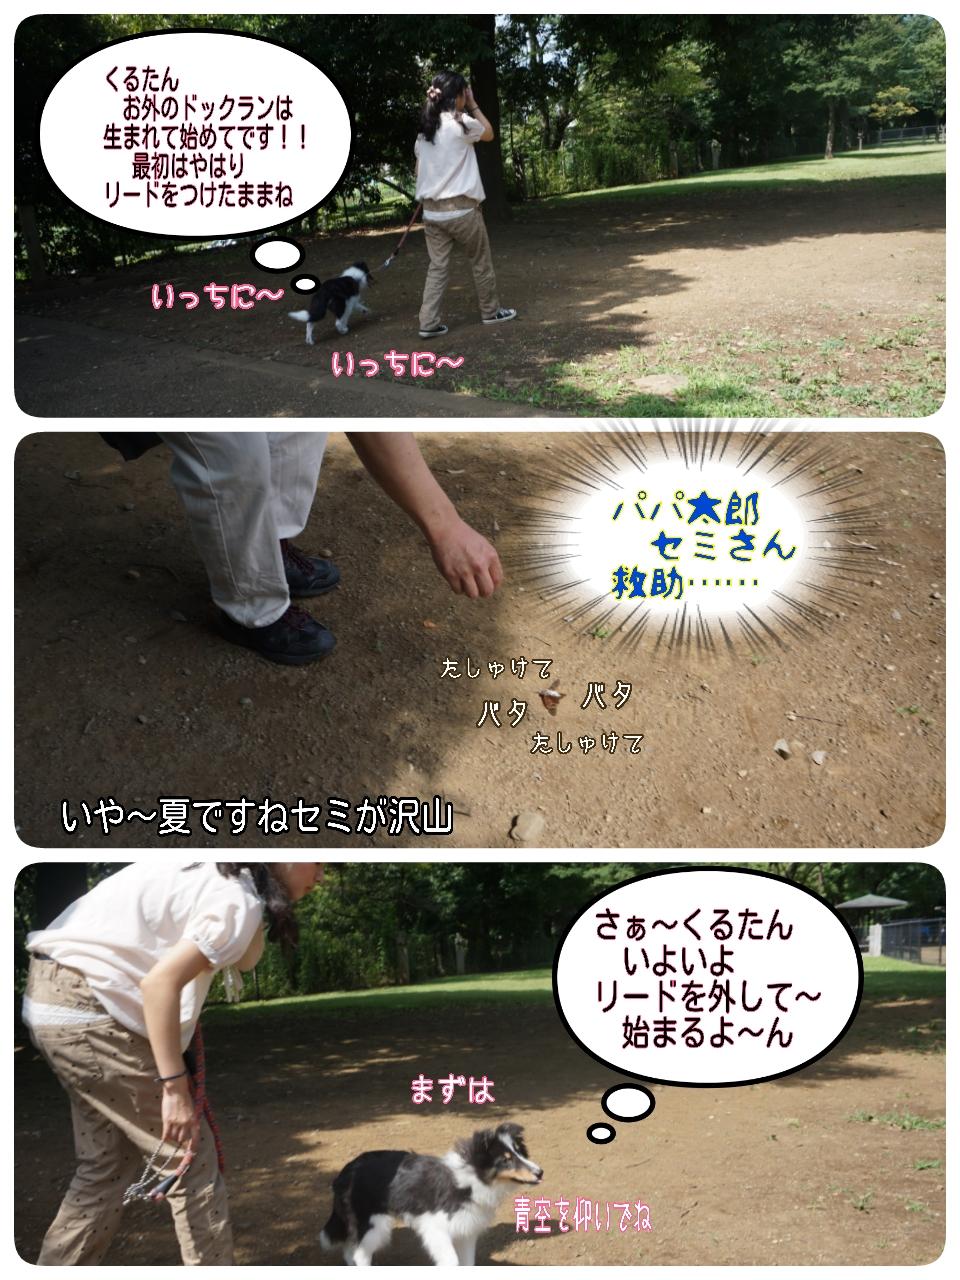 2015-08-09-15-53-33_deco.jpg